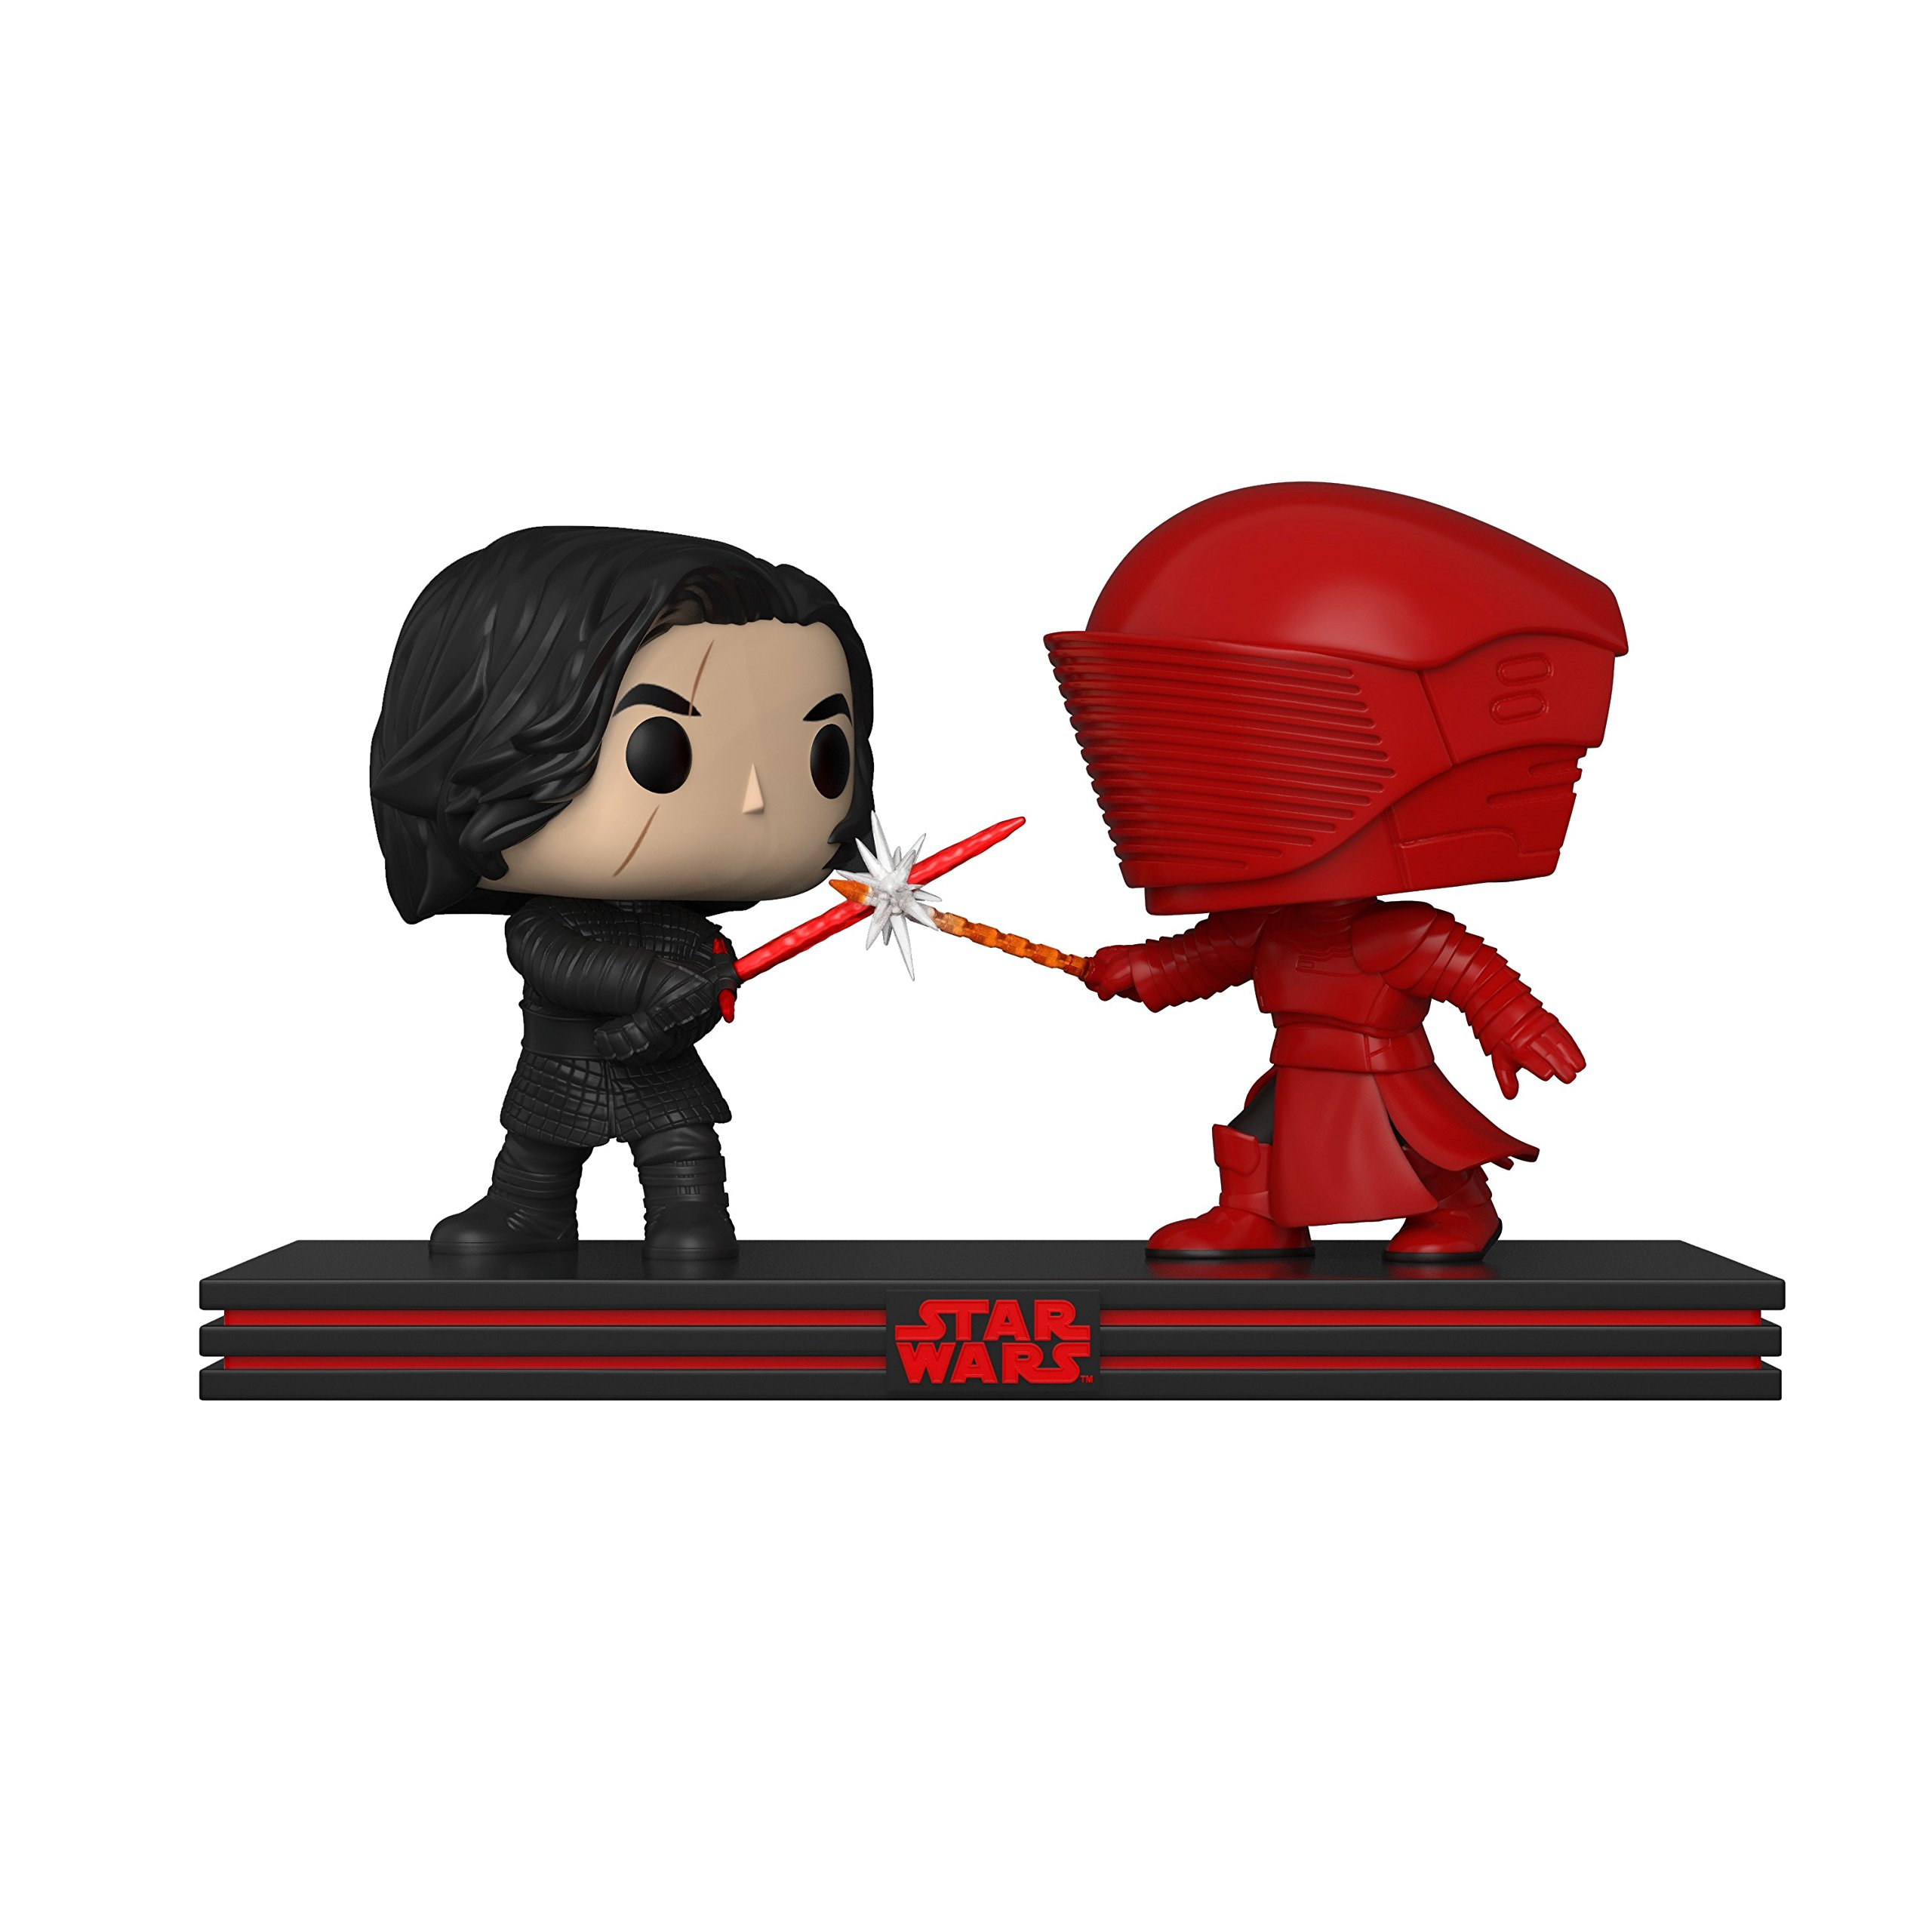 Funko POP! Star Wars Movie Moment: The Last Jedi - Kylo and Praetorian Guard